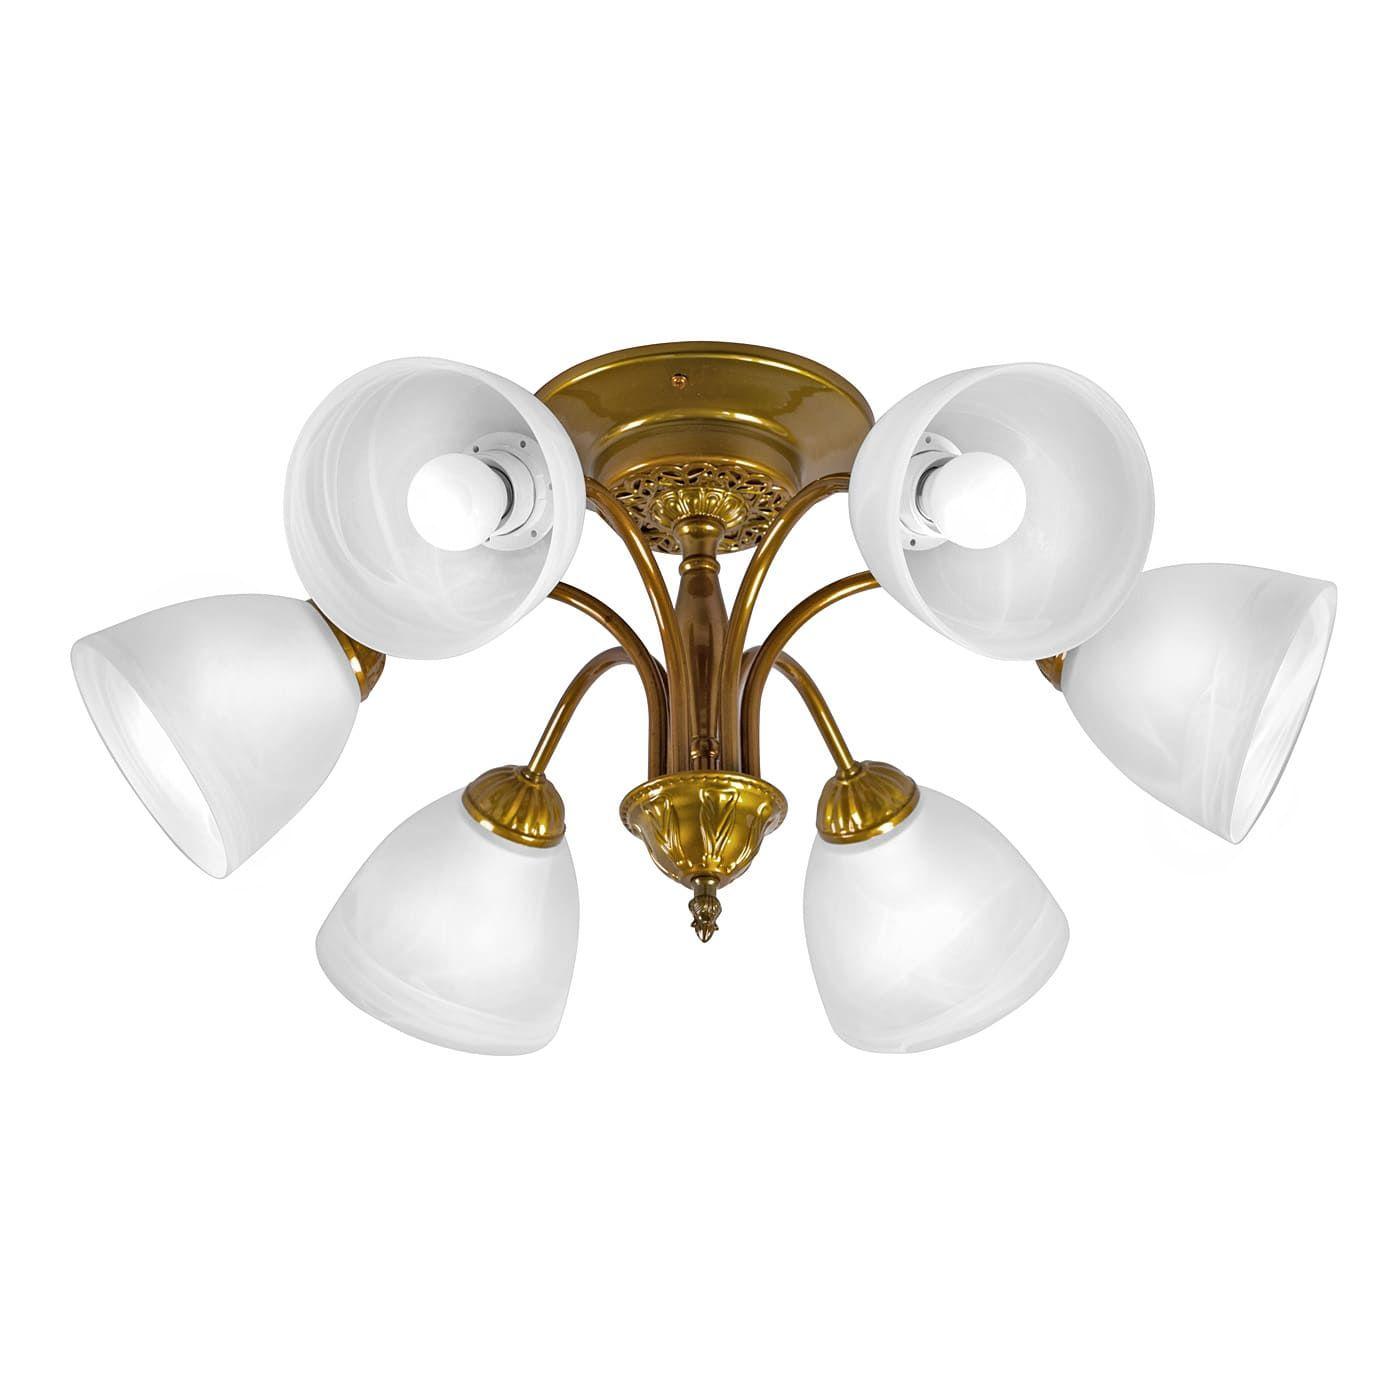 PETRASVET / Ceiling chandelier S2116-6, 6xE27 max. 60W